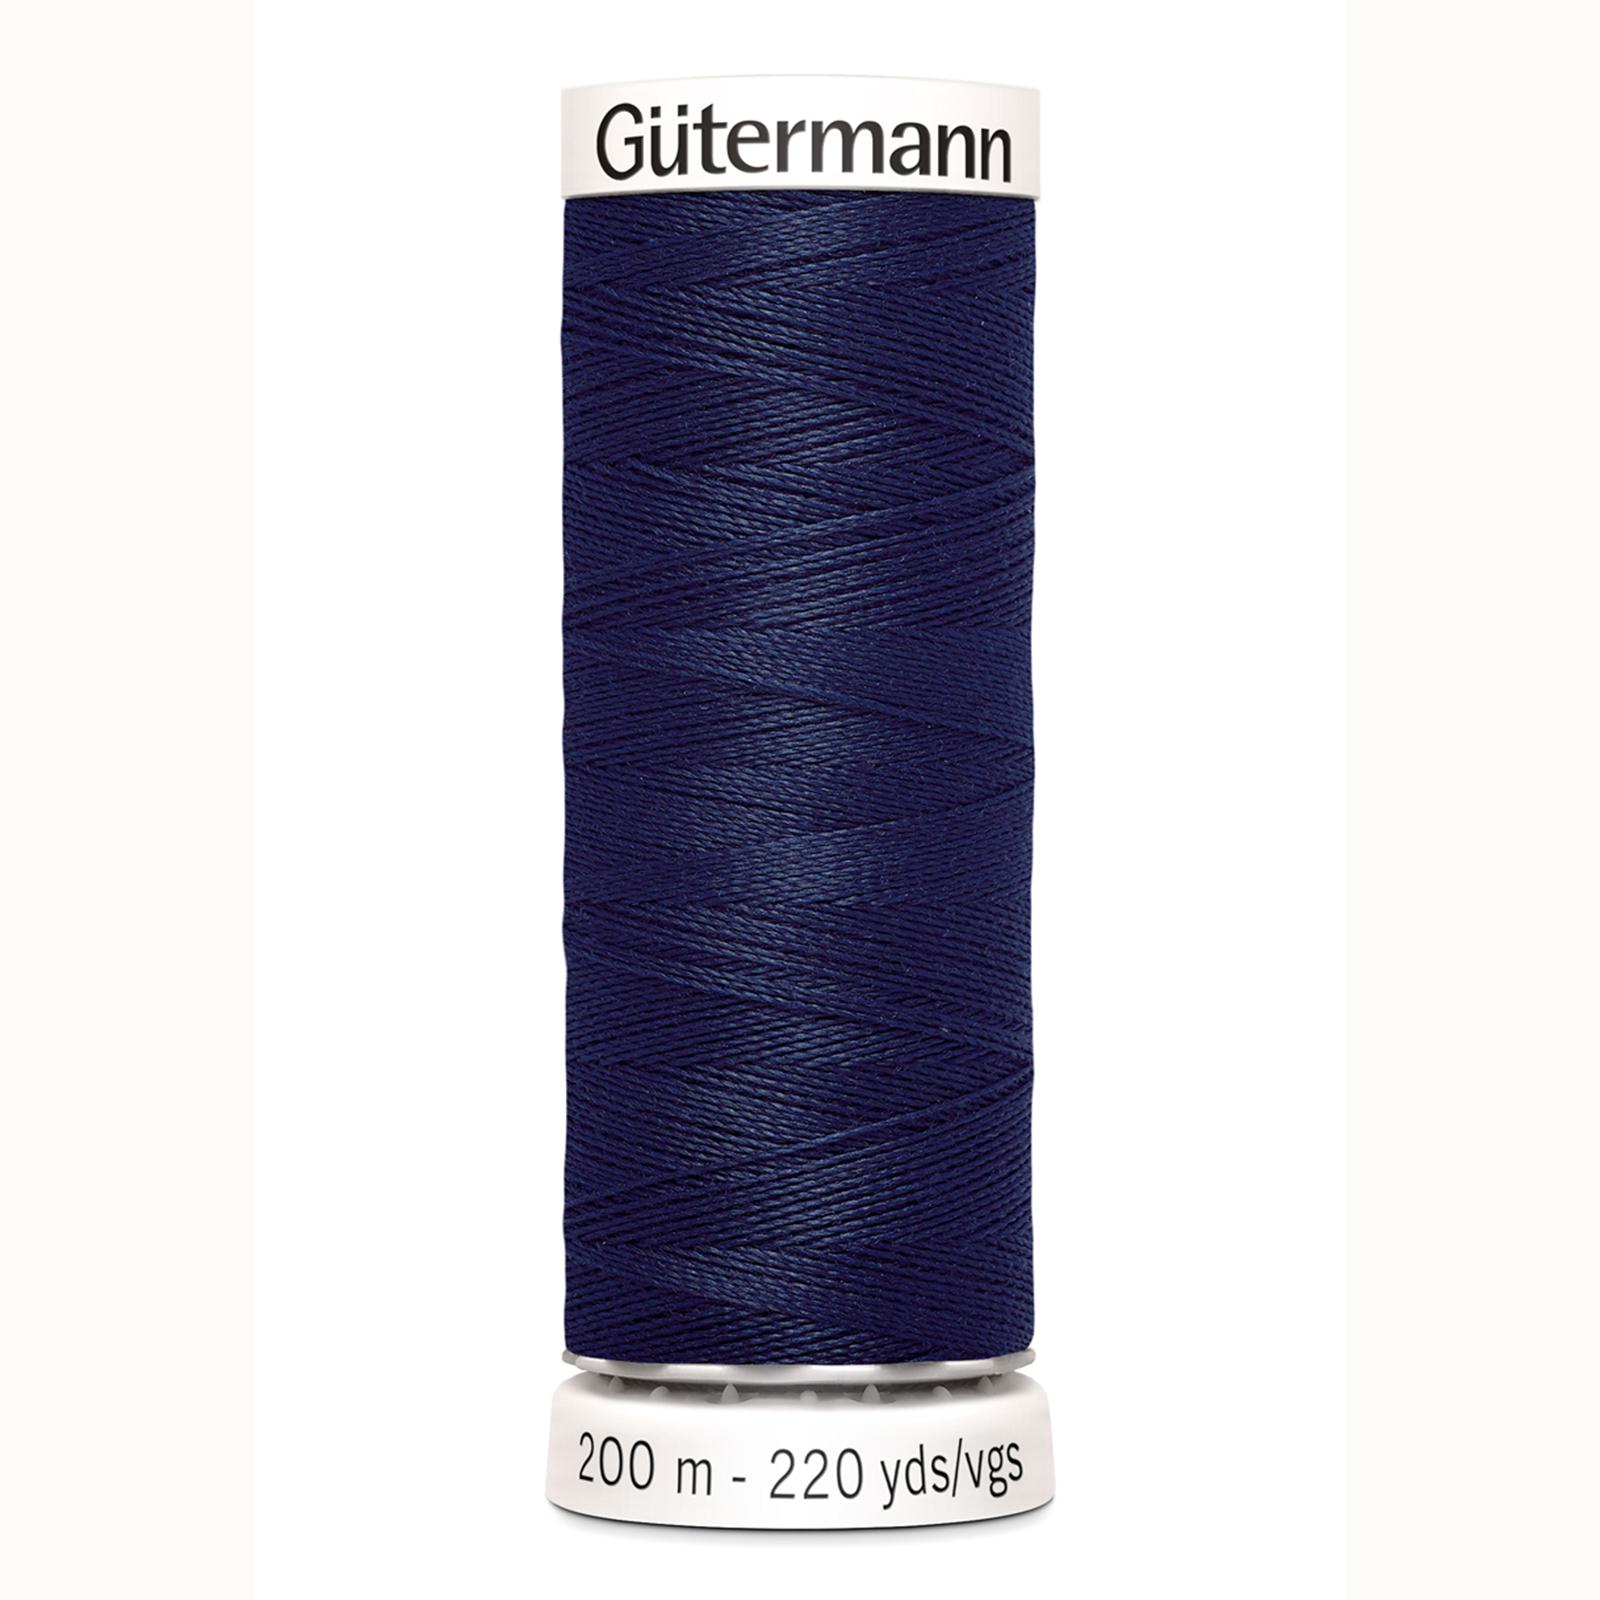 Gutermann Polyestr 200m-711